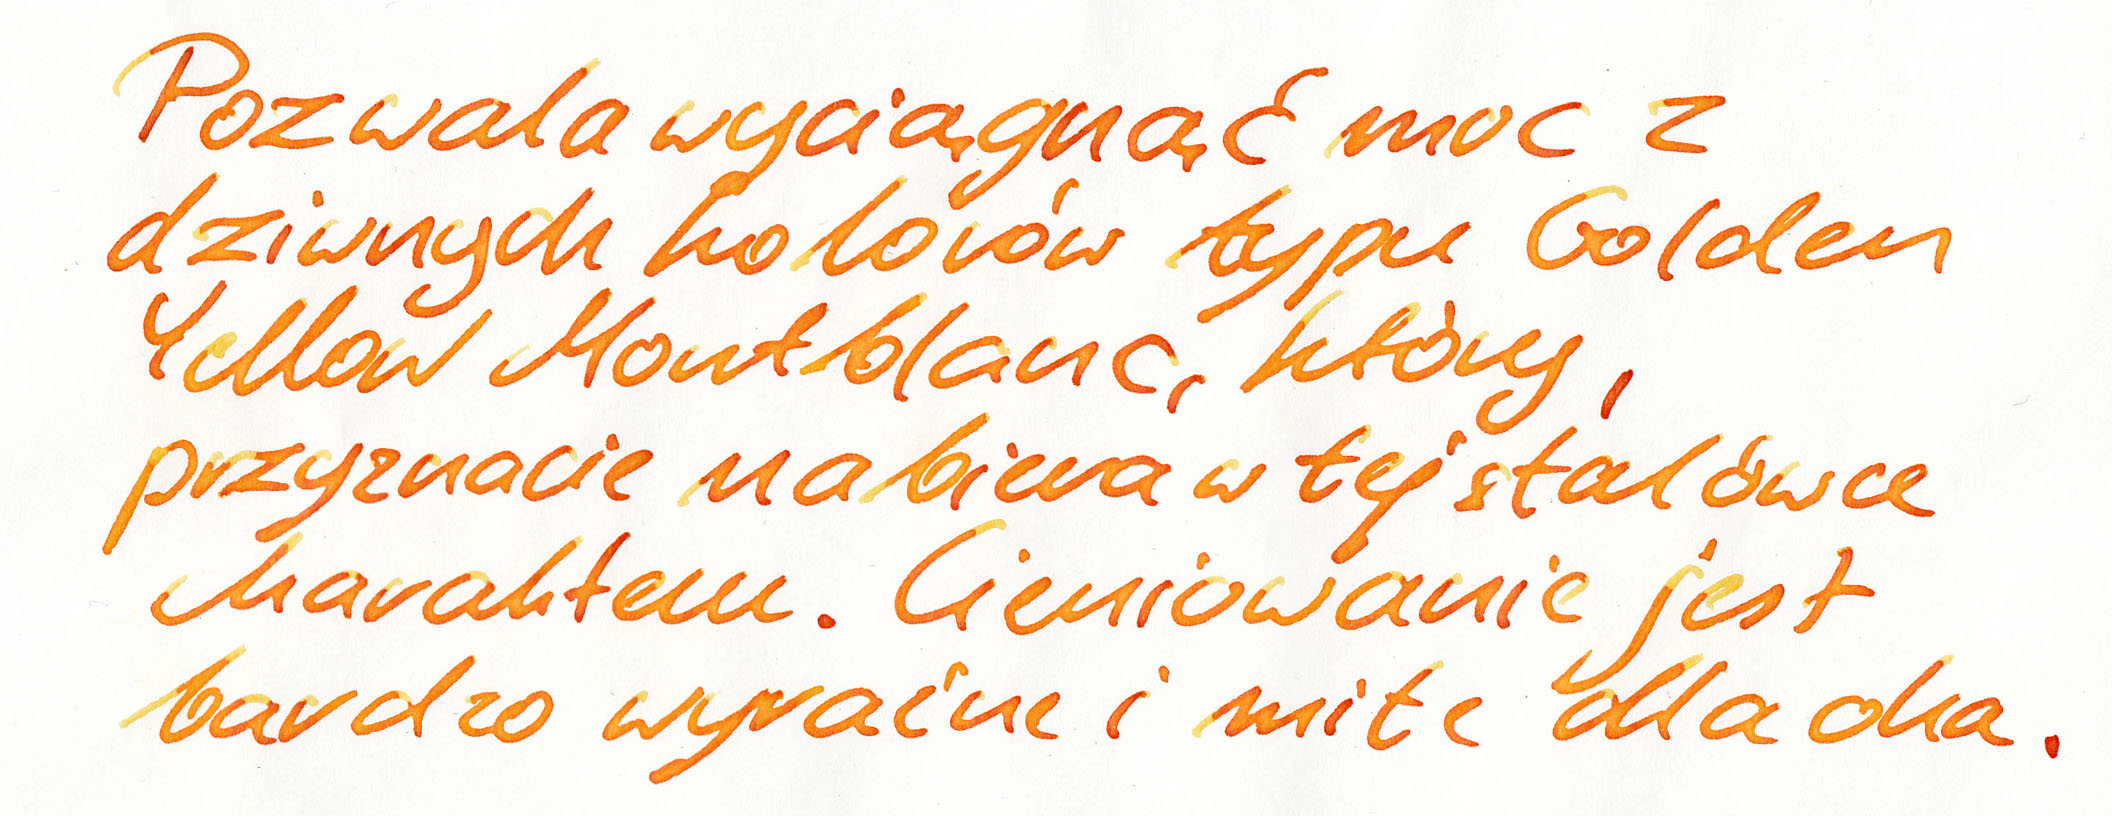 fpn_1459614973__goldenyellow_emotica_1.j